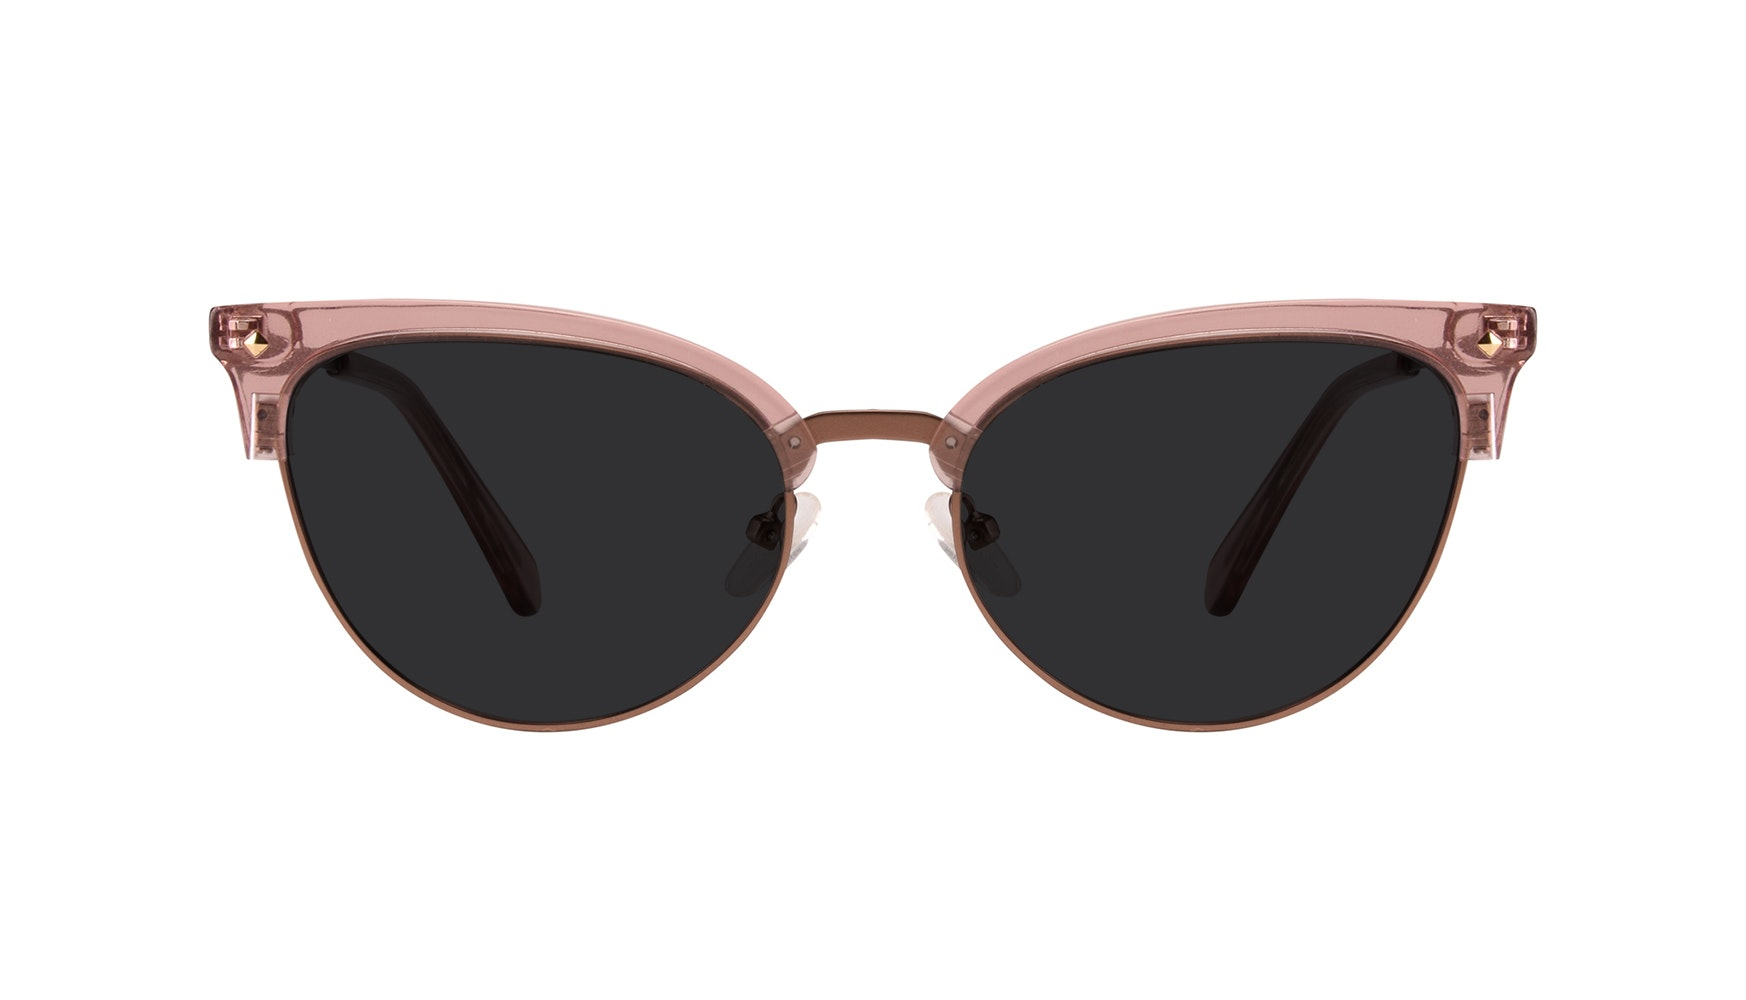 Affordable Fashion Glasses Cat Eye Sunglasses Women Moon Rose